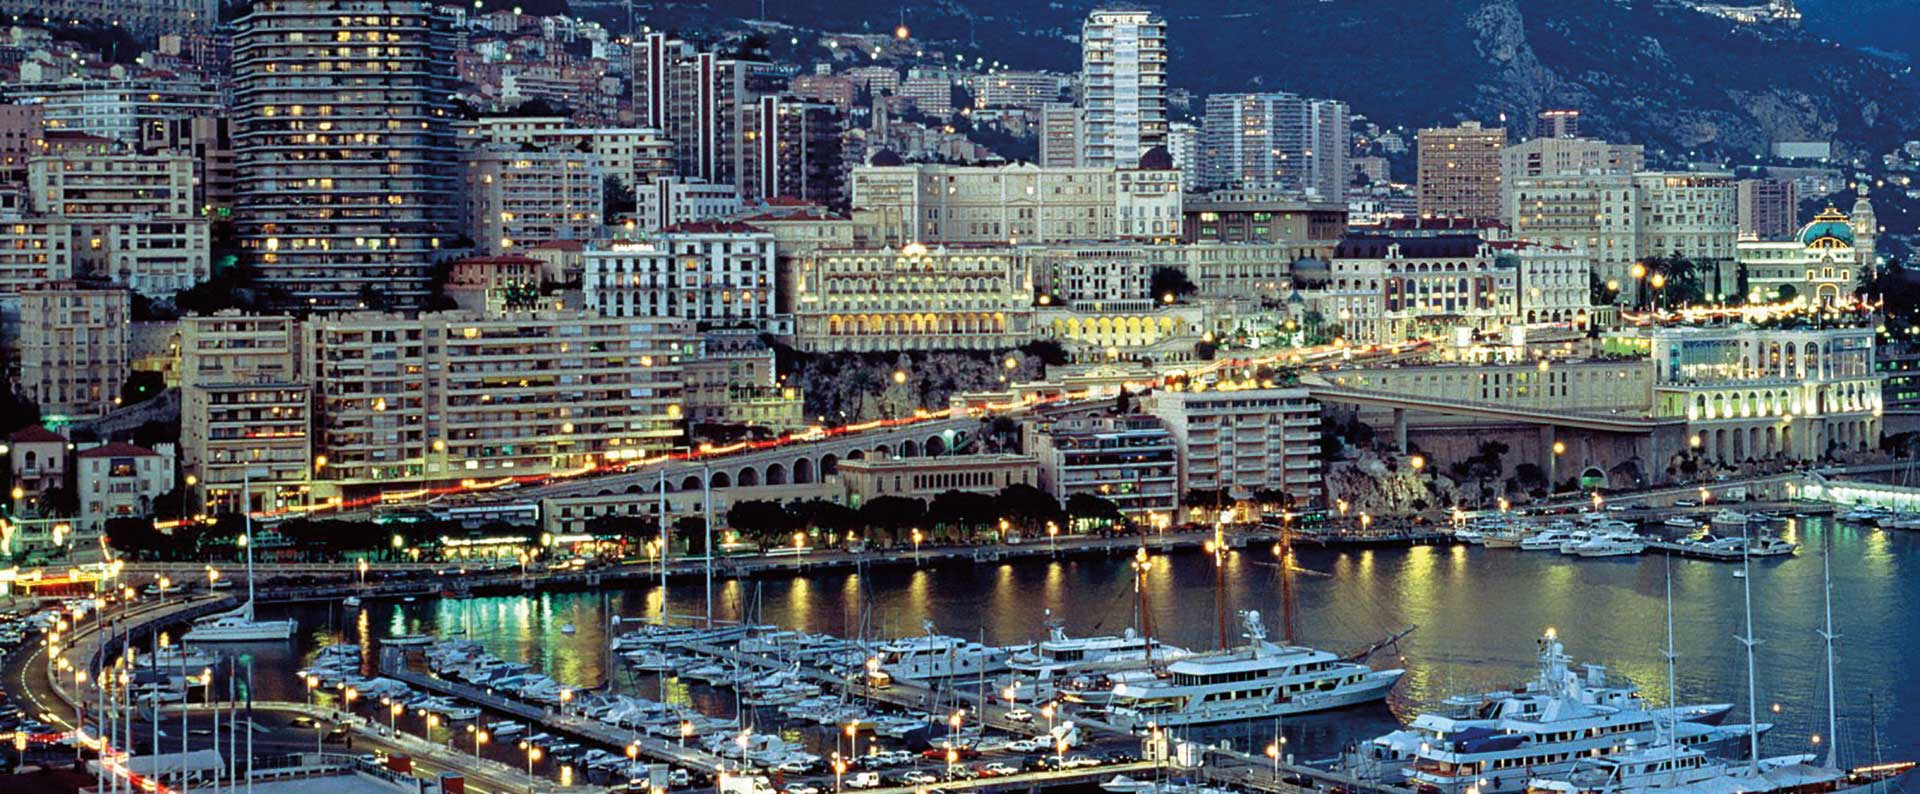 Monaco Dock